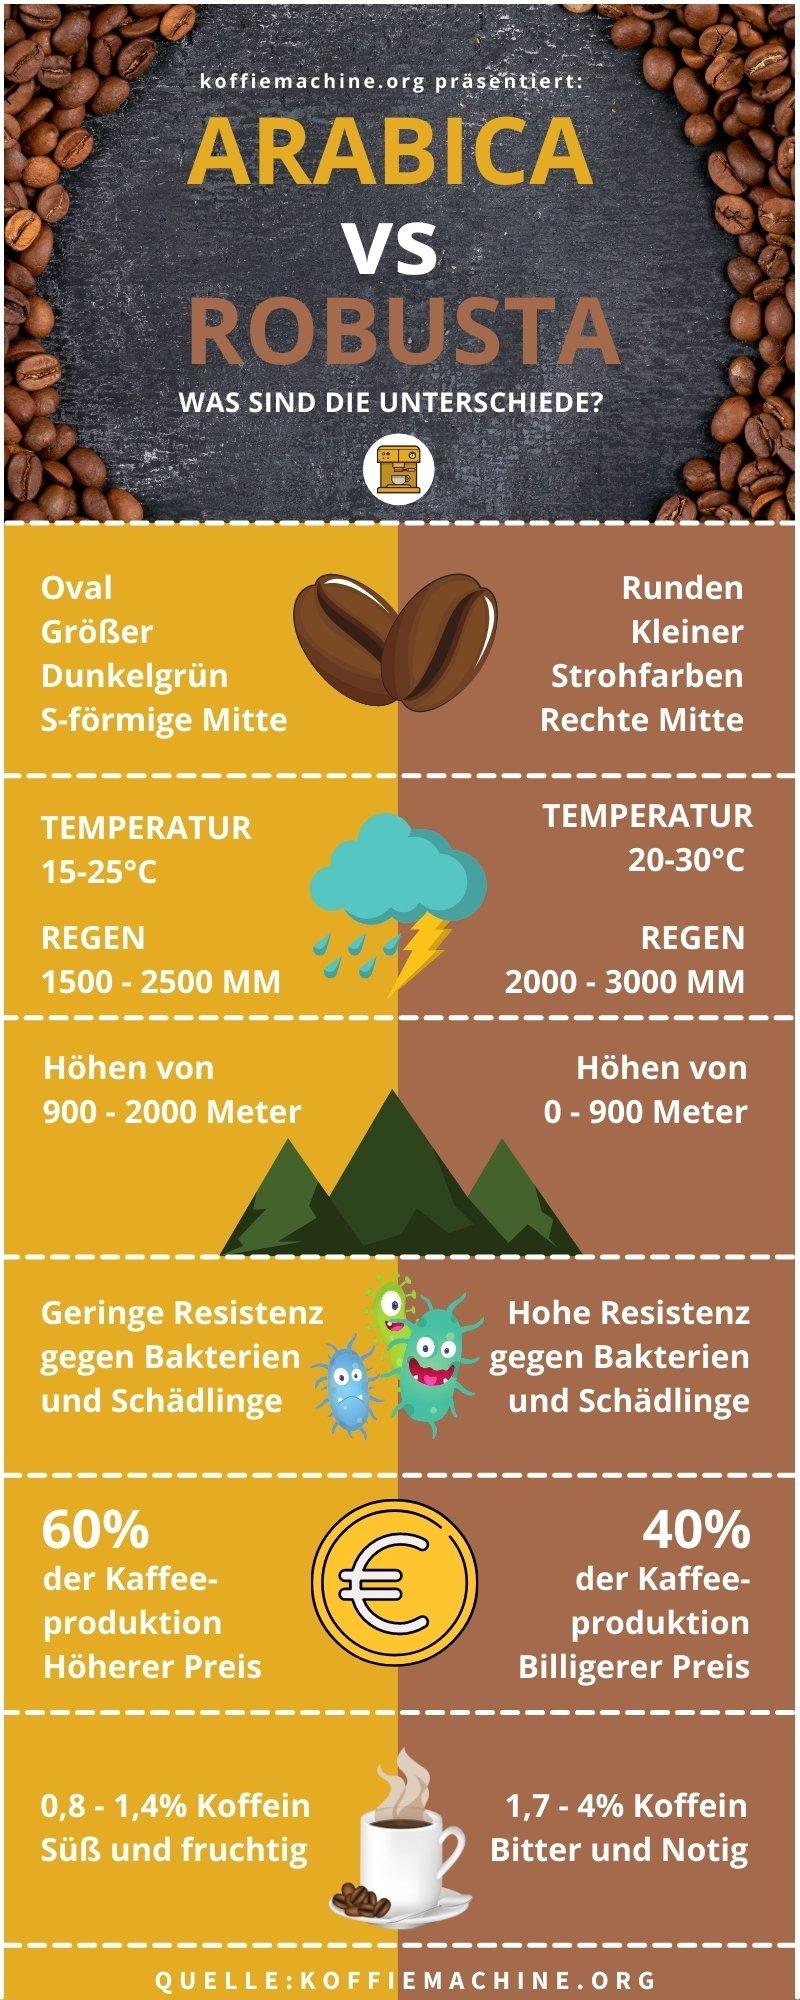 Infografik Arabica vs Robusta Kaffee Unterschied